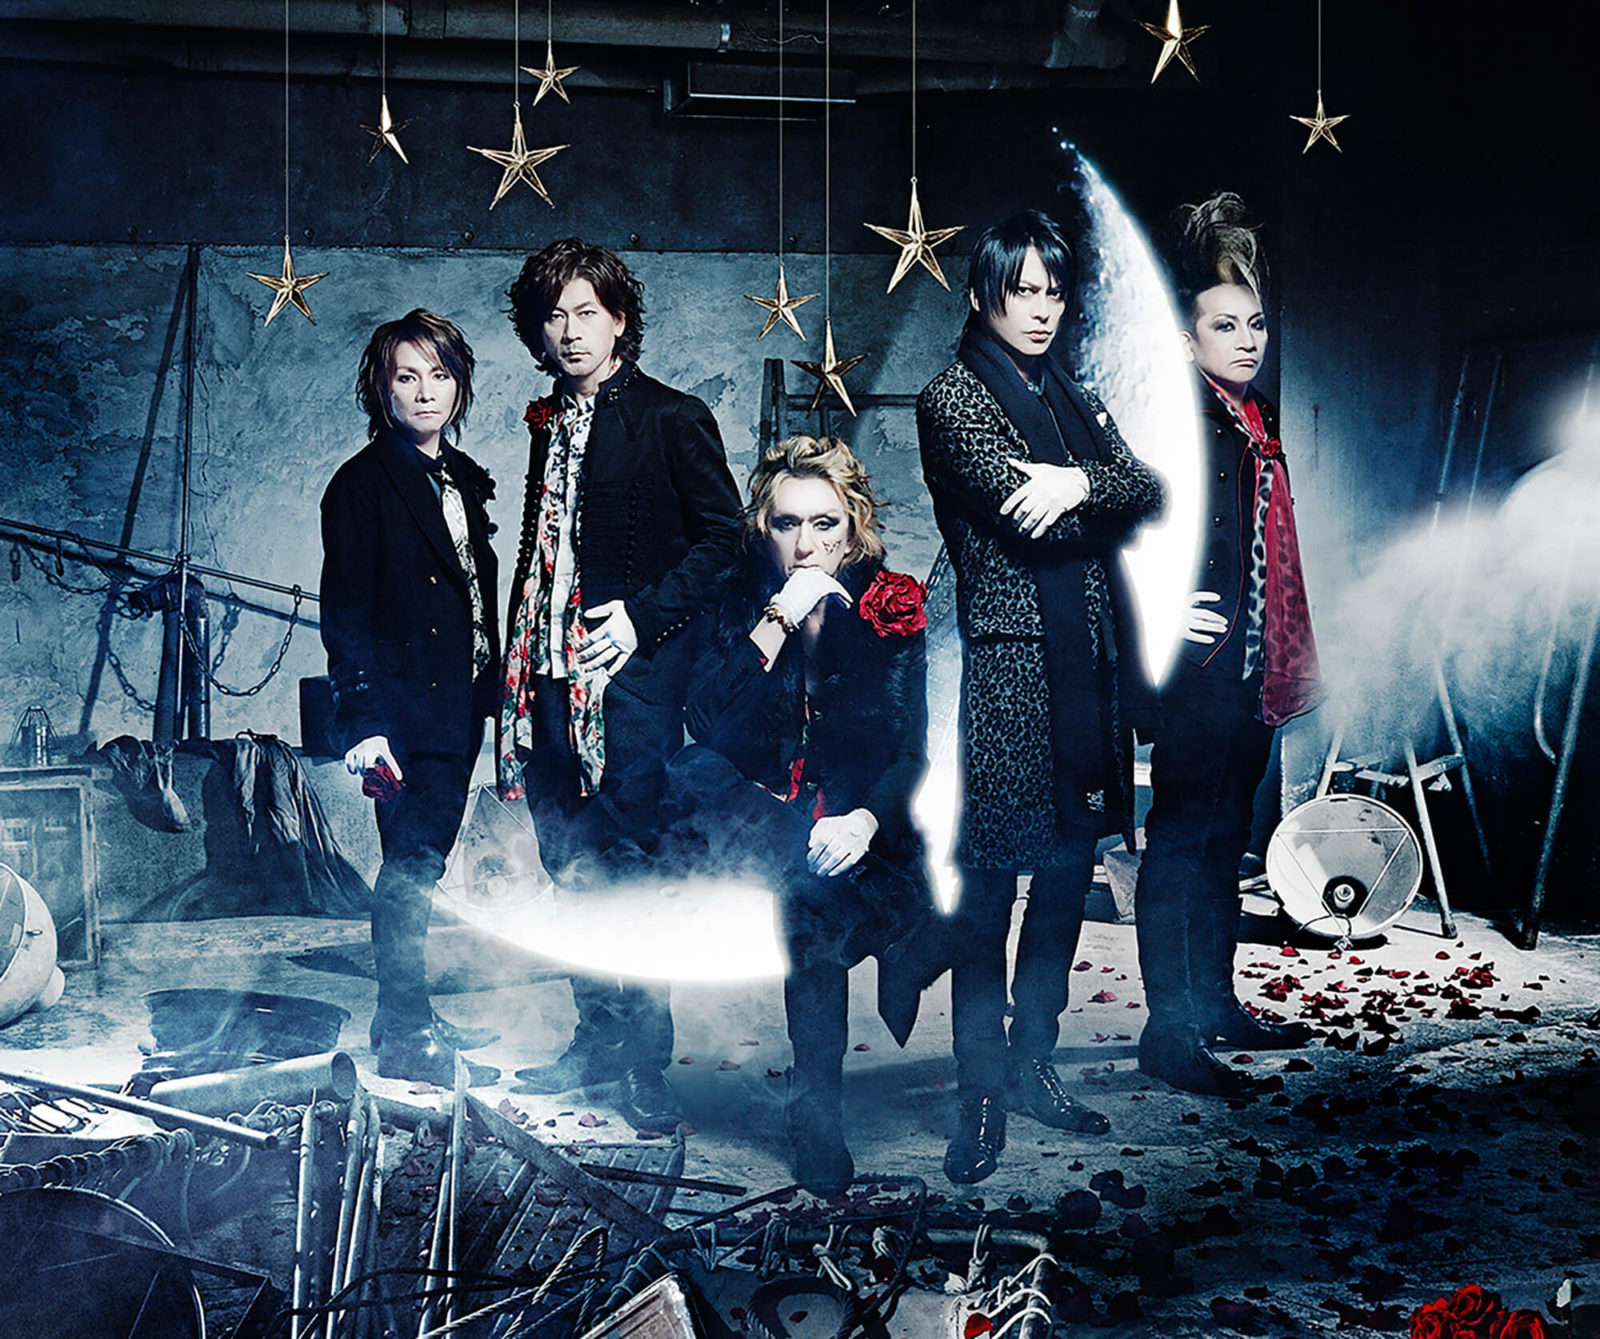 BUCK-TICK スタンディングツアー「TOUR No.0 - Guernican Moon -」の開催が決定!